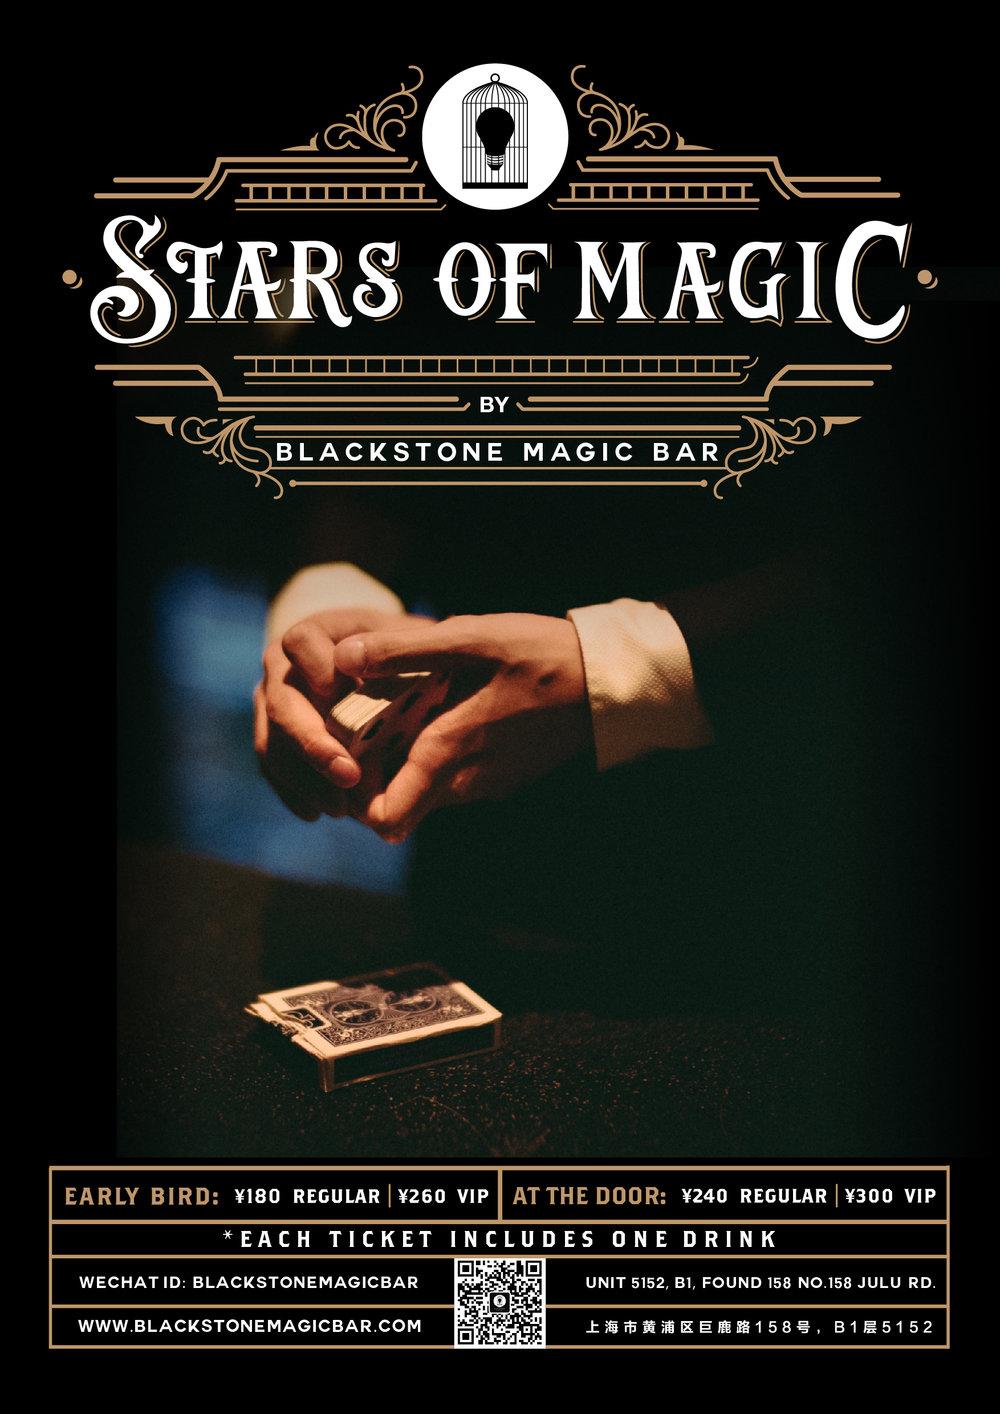 Stars of magic-0607-无姓名-01.jpg